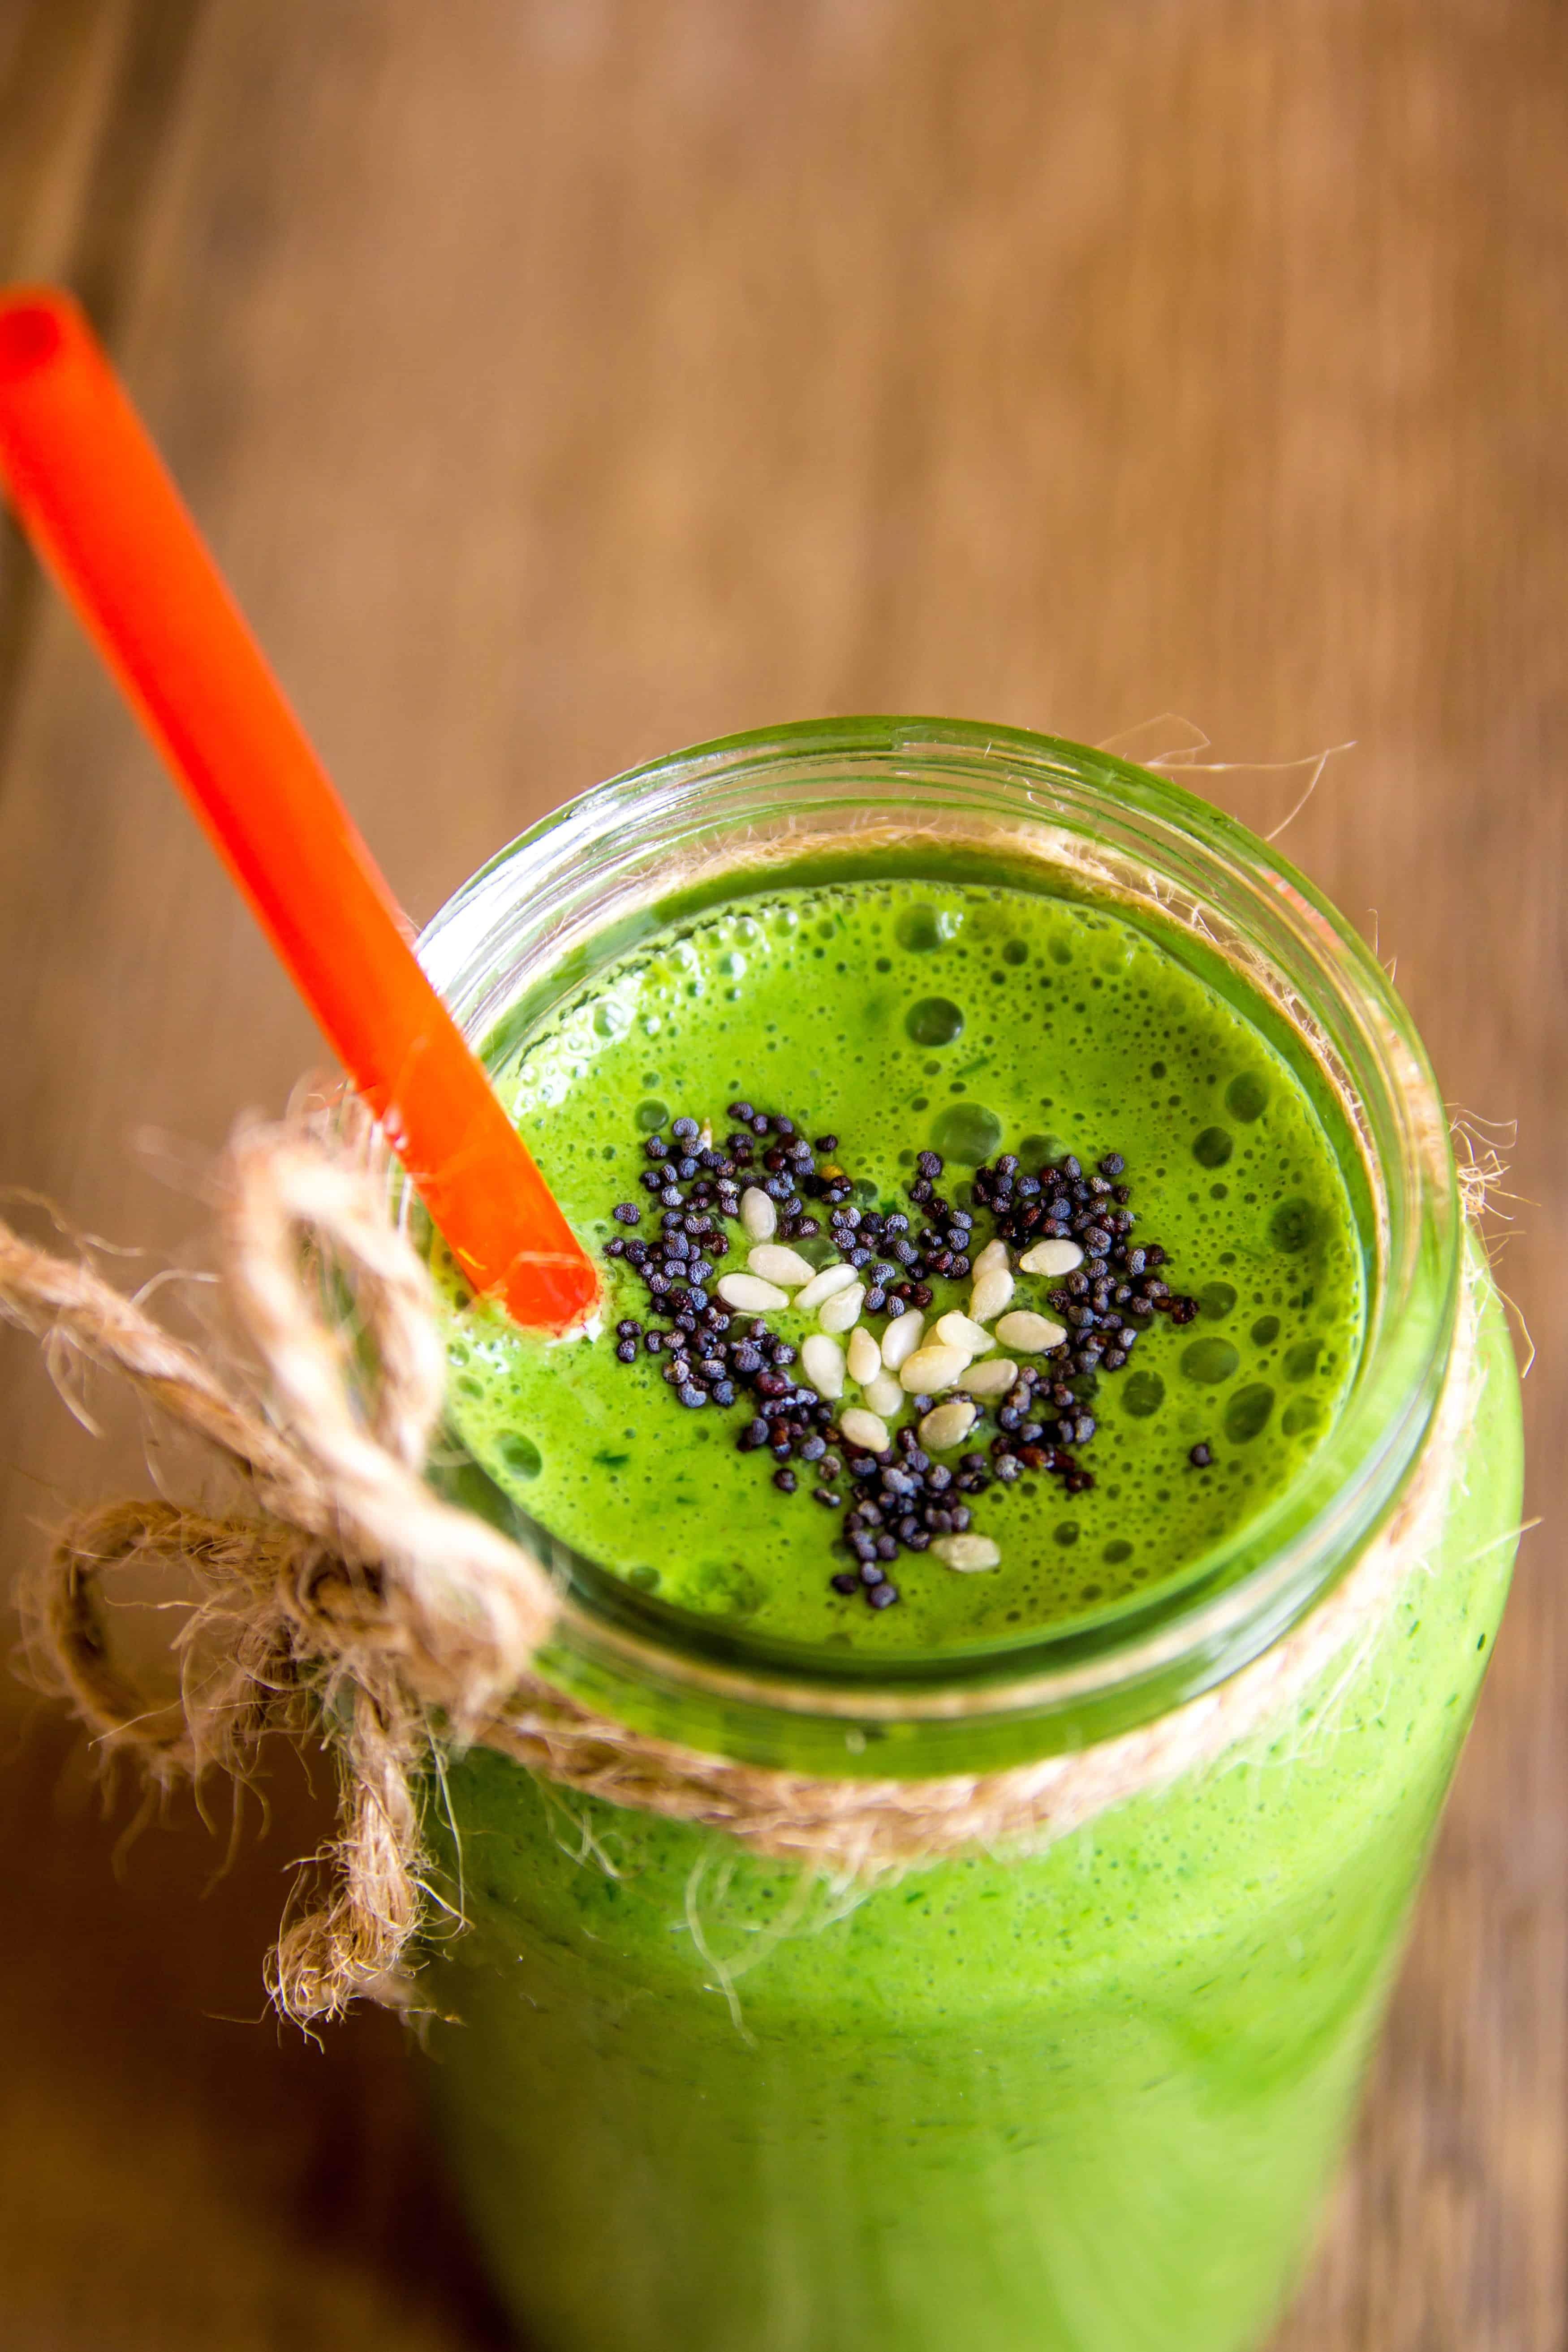 How to Make Green Smoothies Taste Good